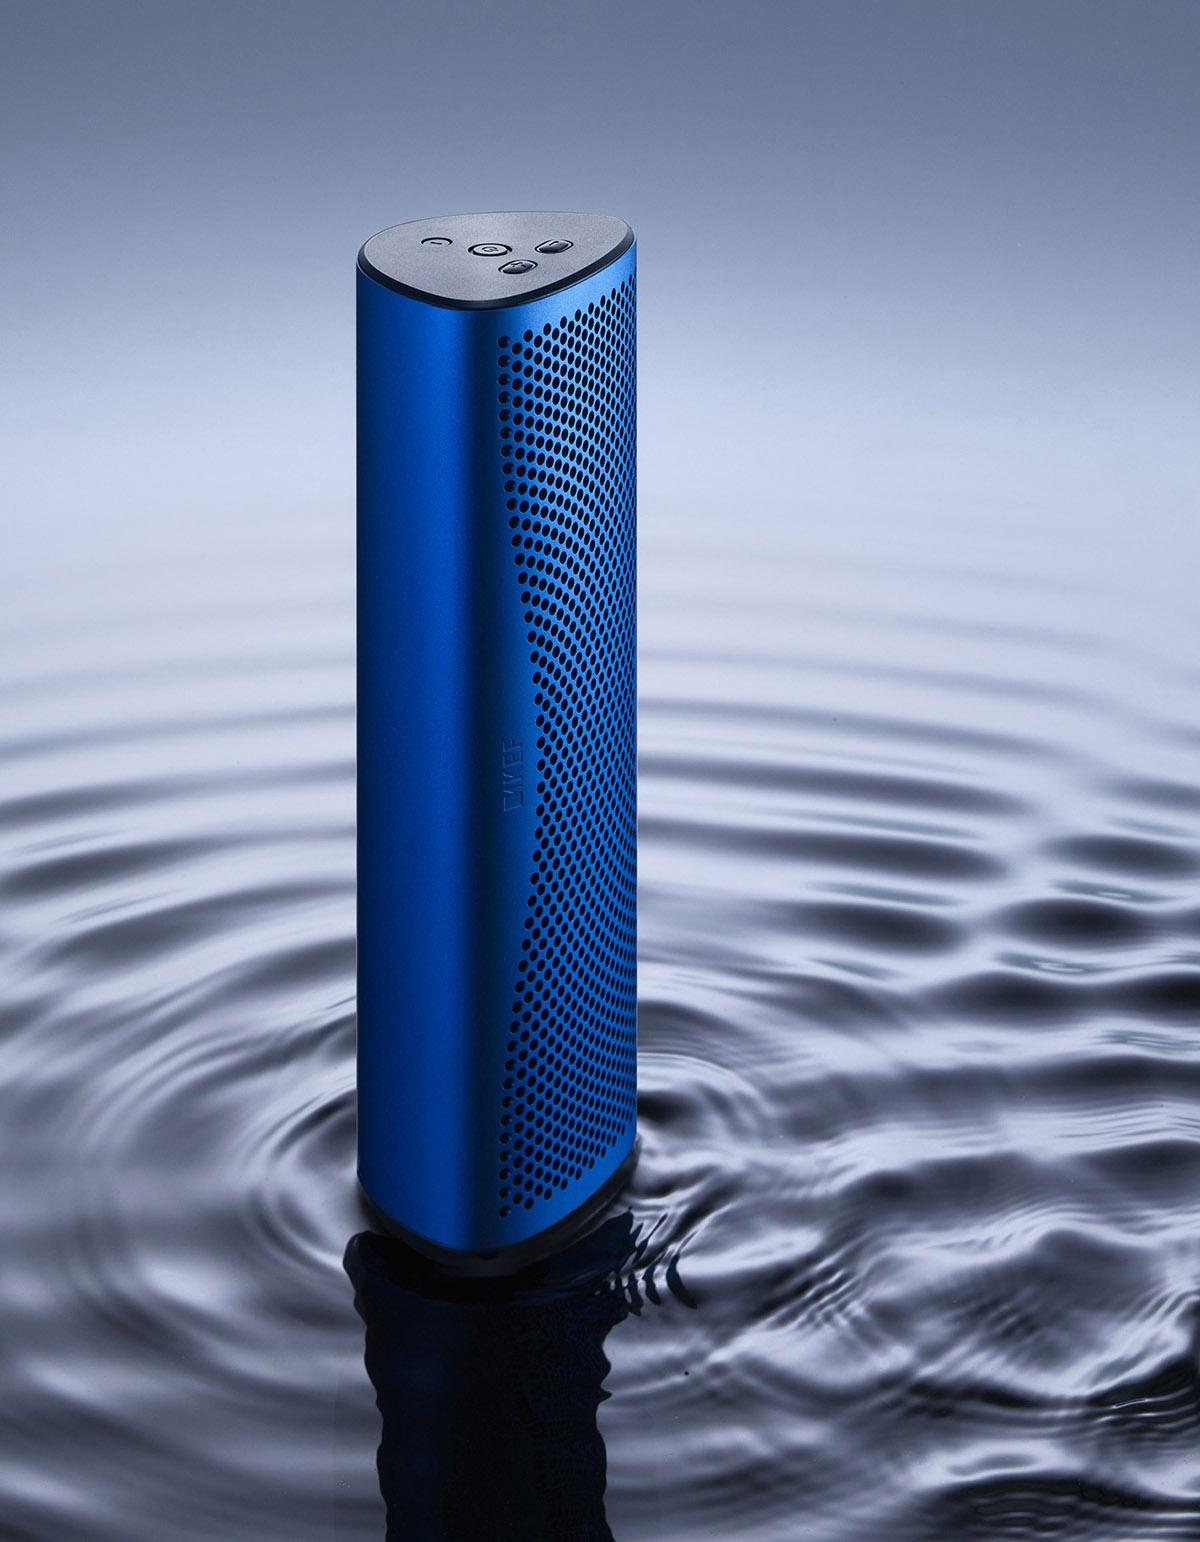 kef-muo-speaker-ross-lovegrove-computational-design-andrea-locatelli-06.jpg